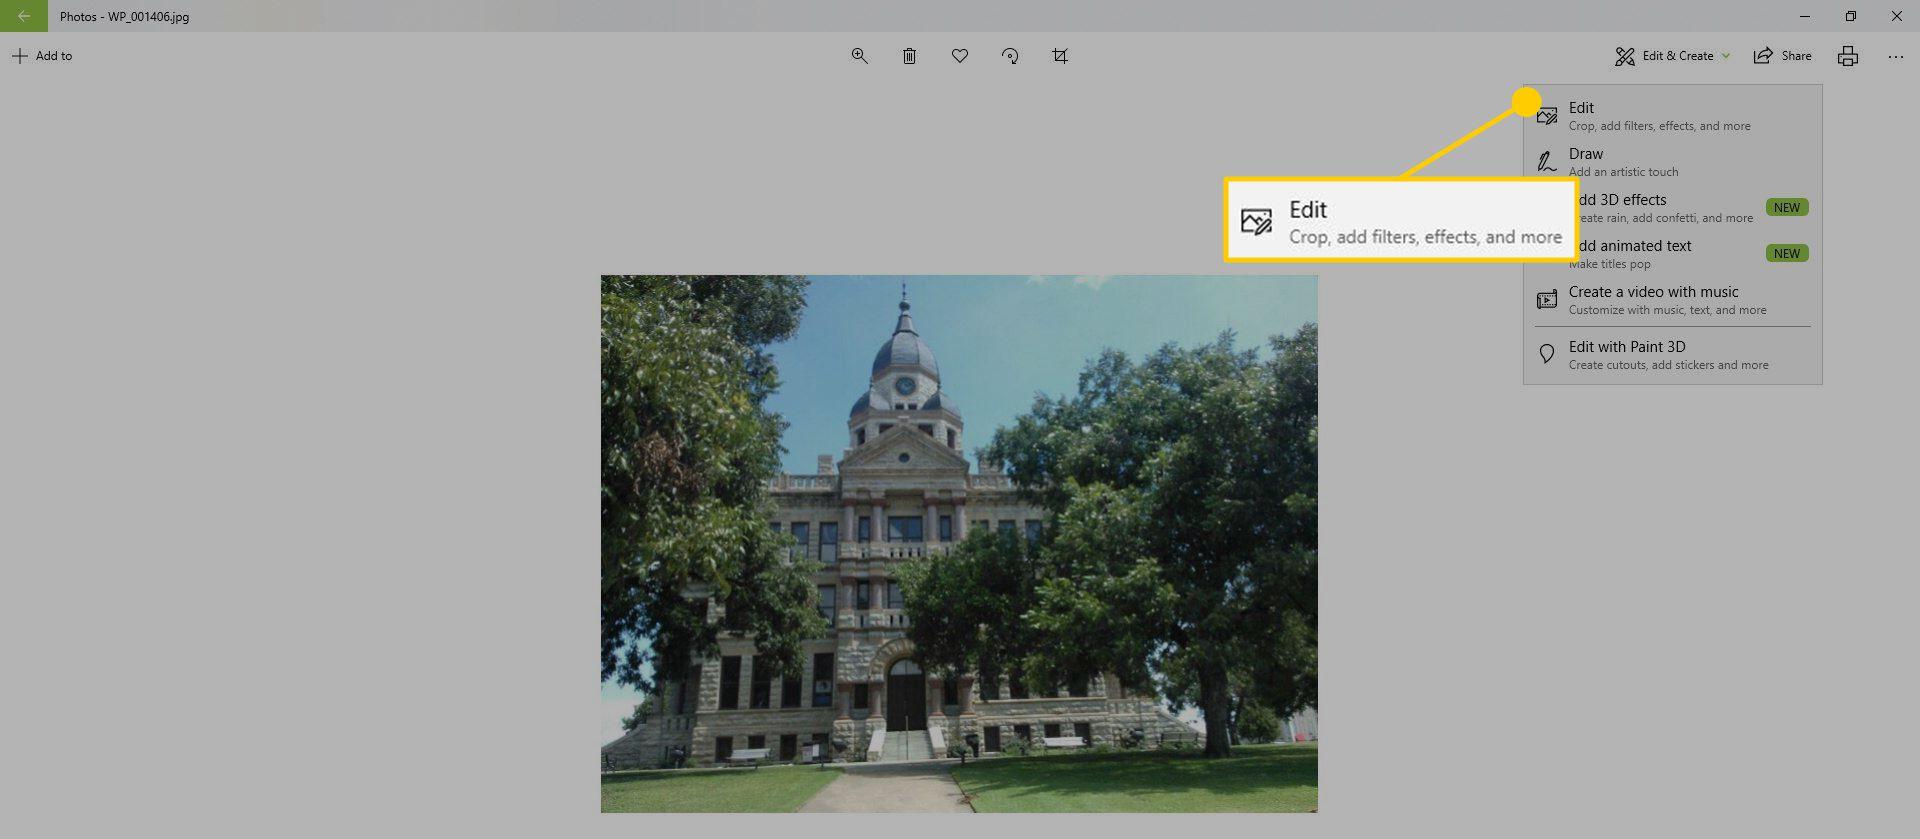 How to Use Microsoft Photos